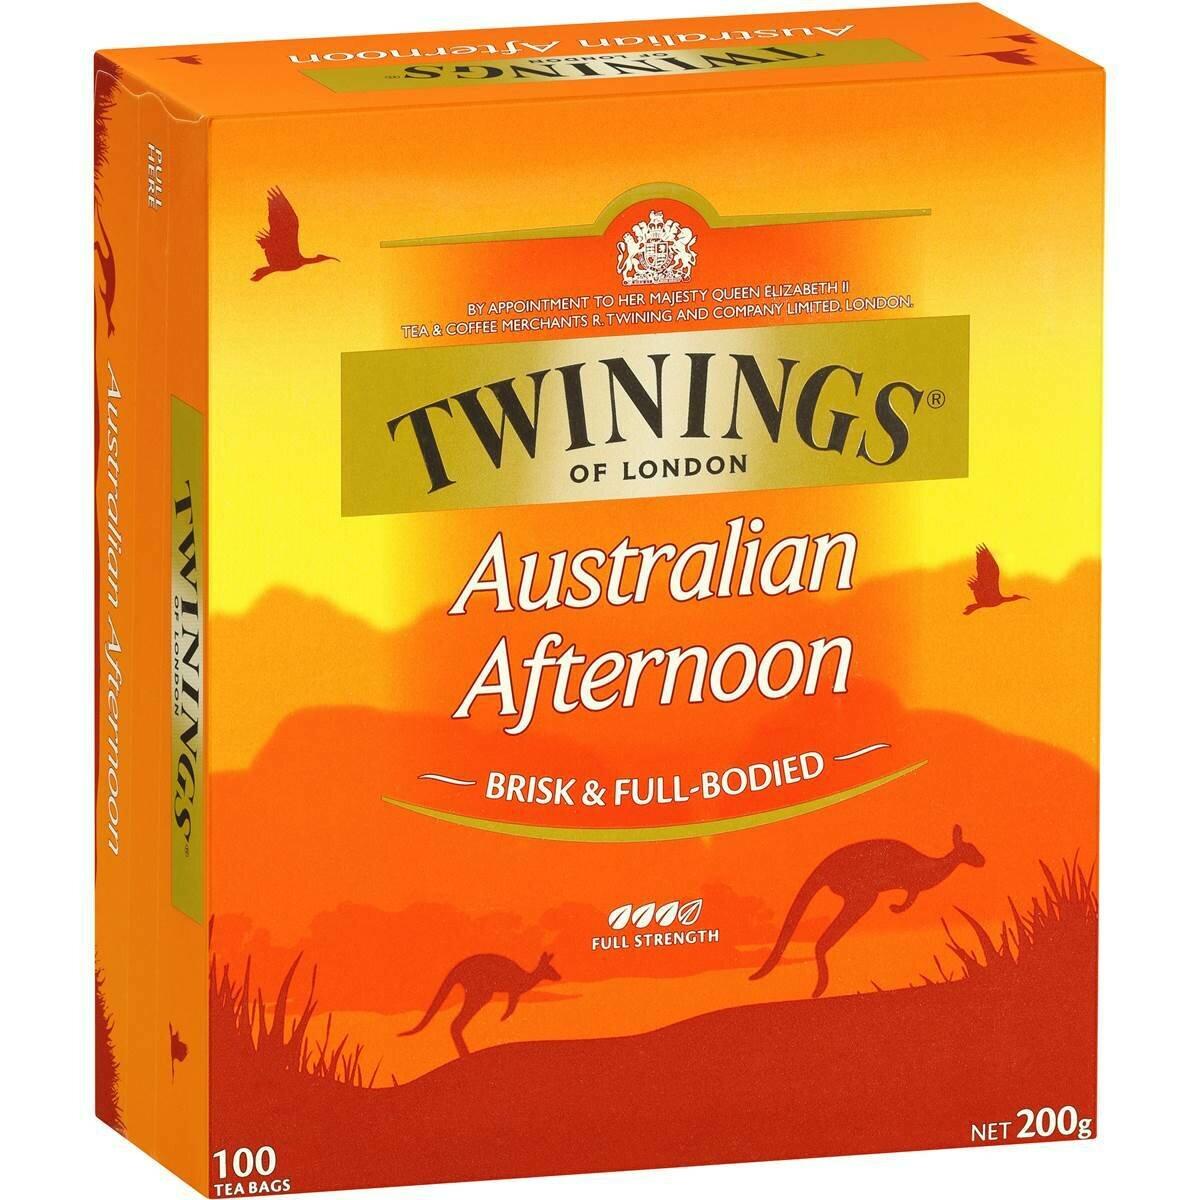 Twining Australian Afternoon 200G